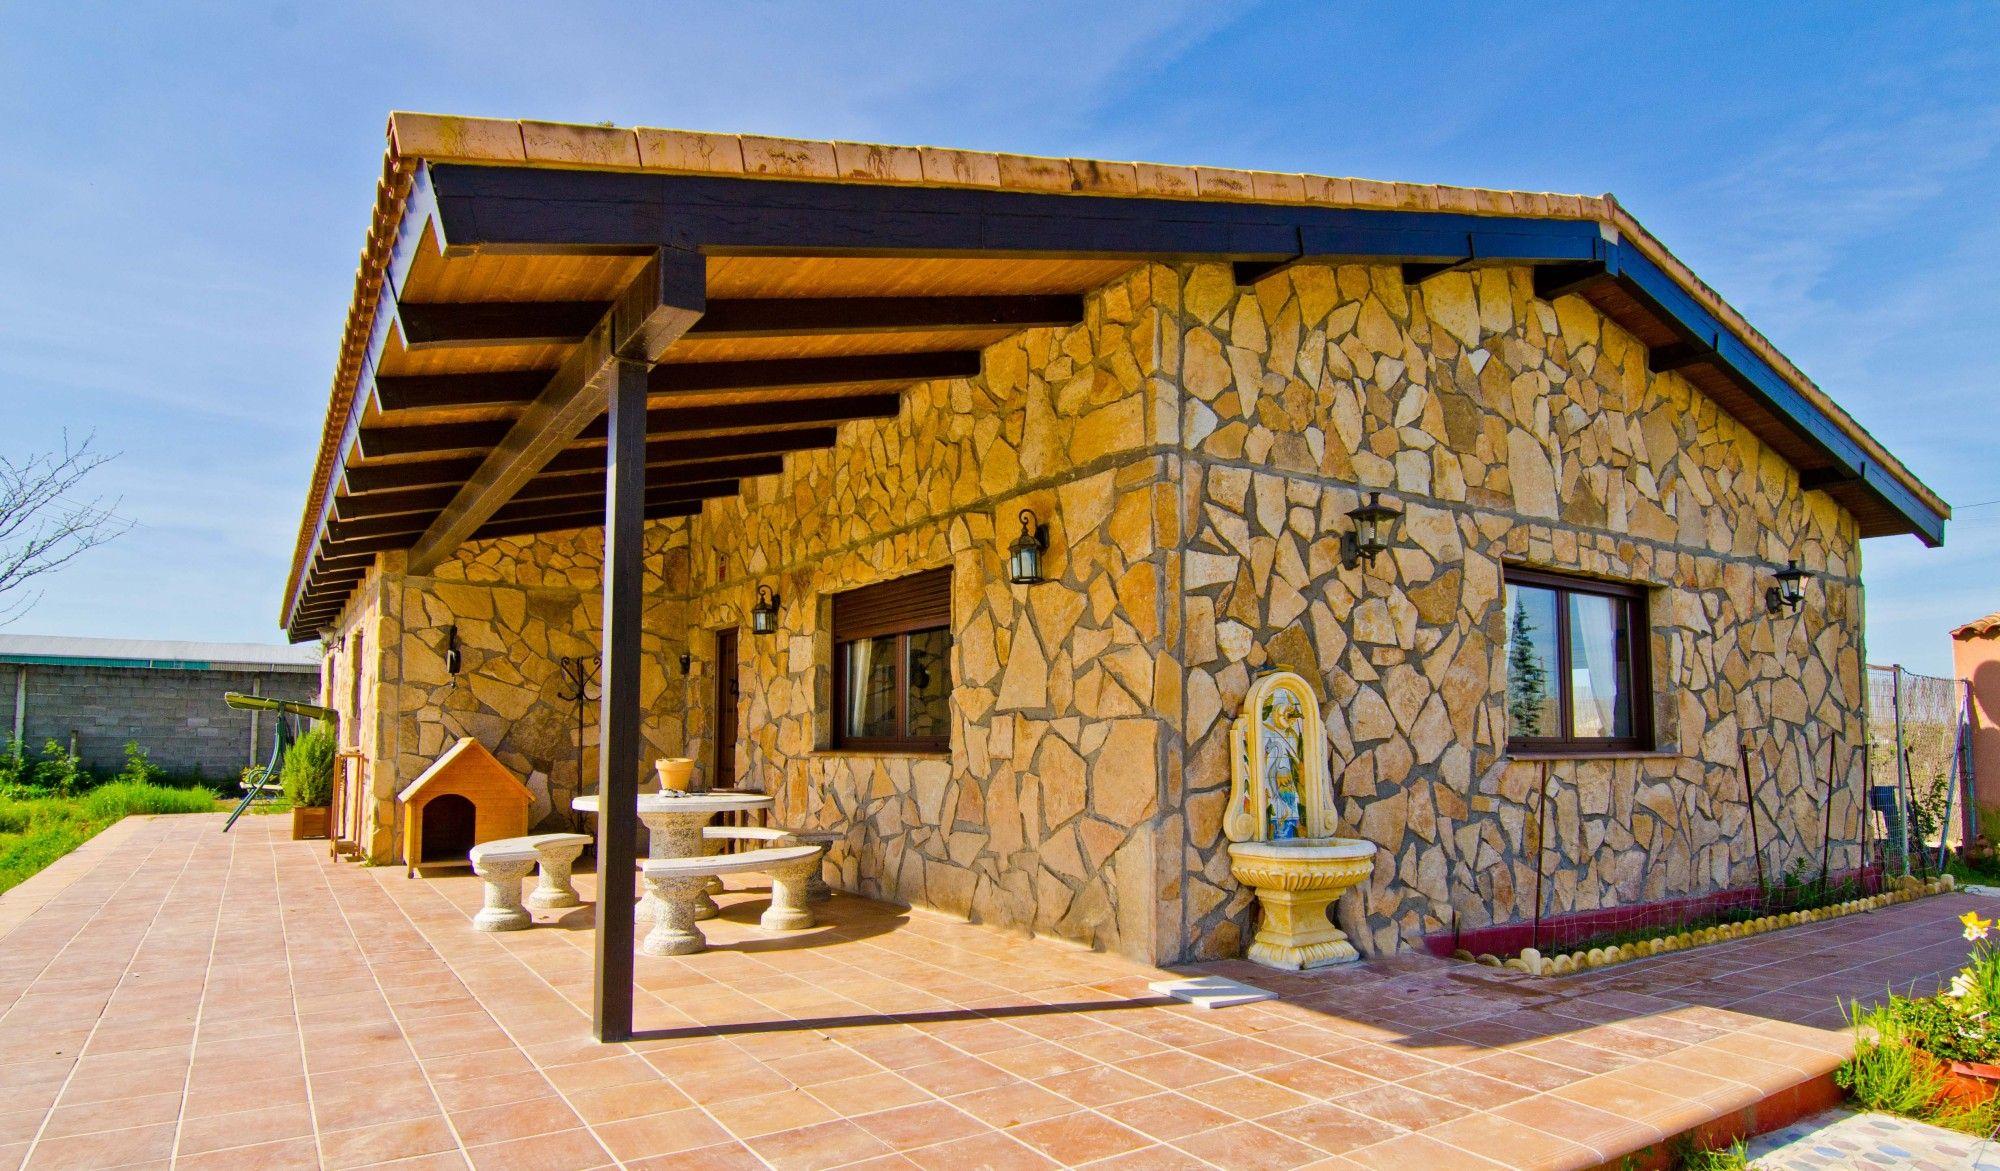 Casa modular hormigon precio stunning casa en san cugat - Precio casa prefabricada hormigon ...